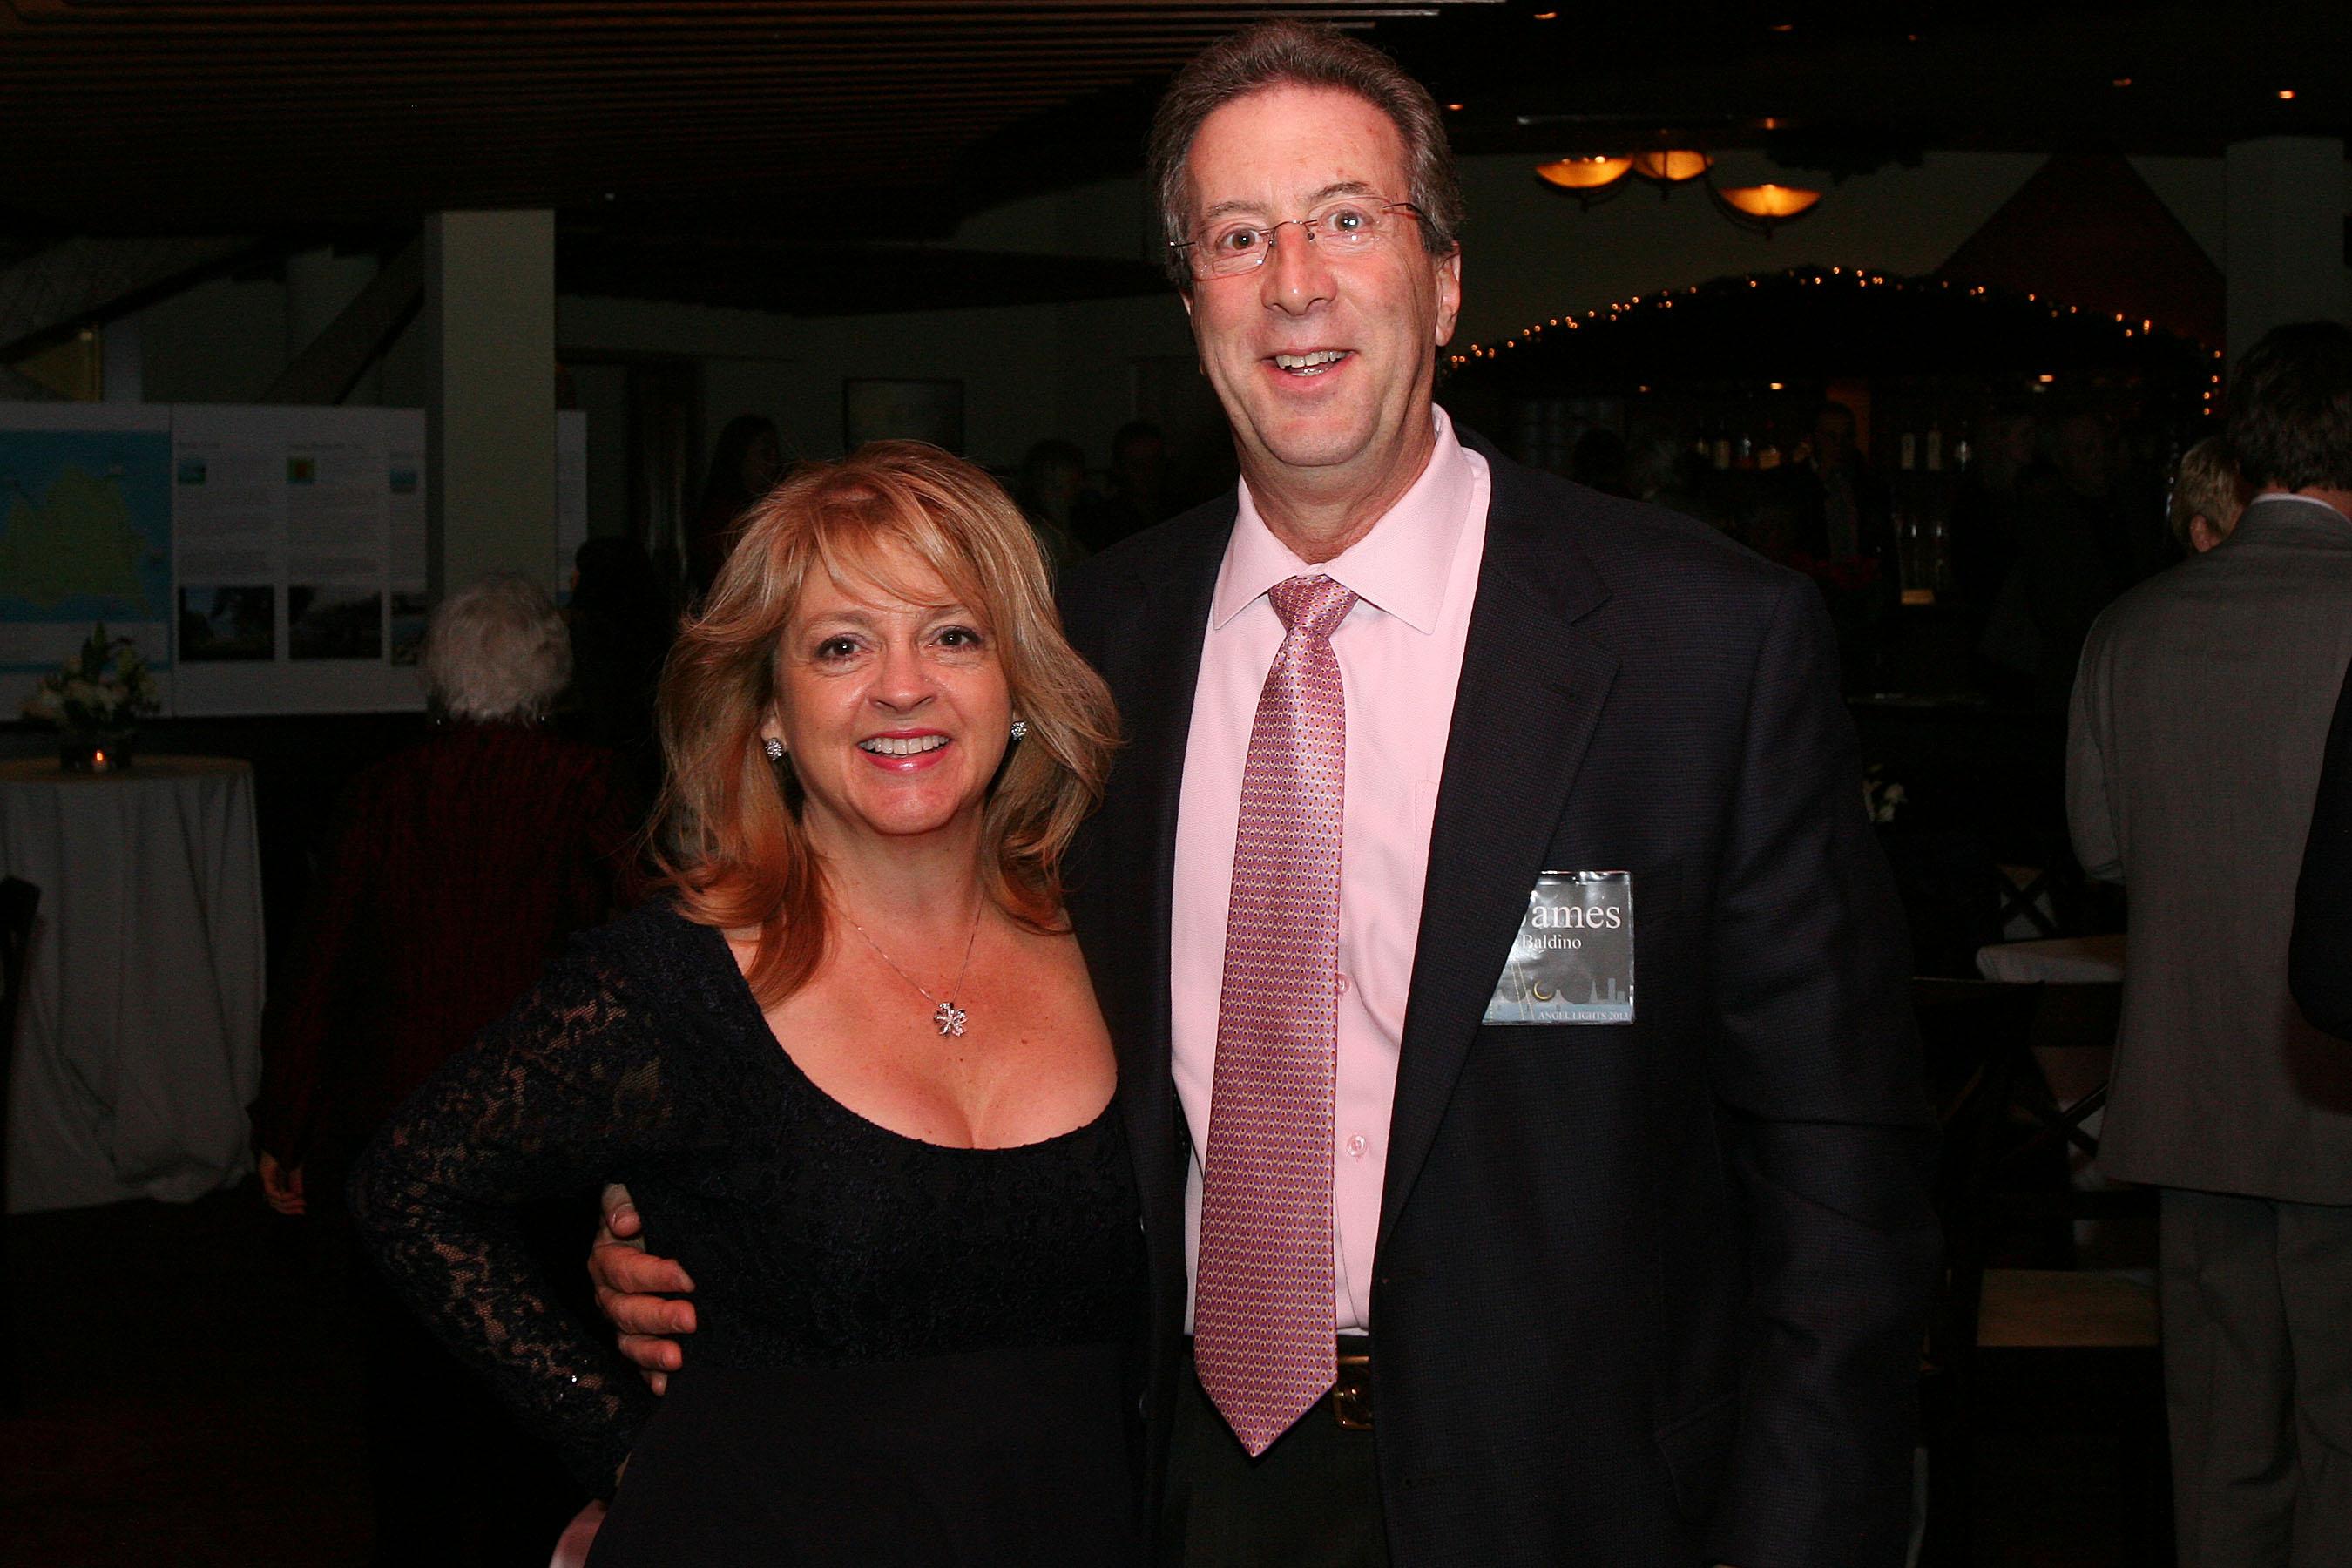 Rosanne & James Baldino